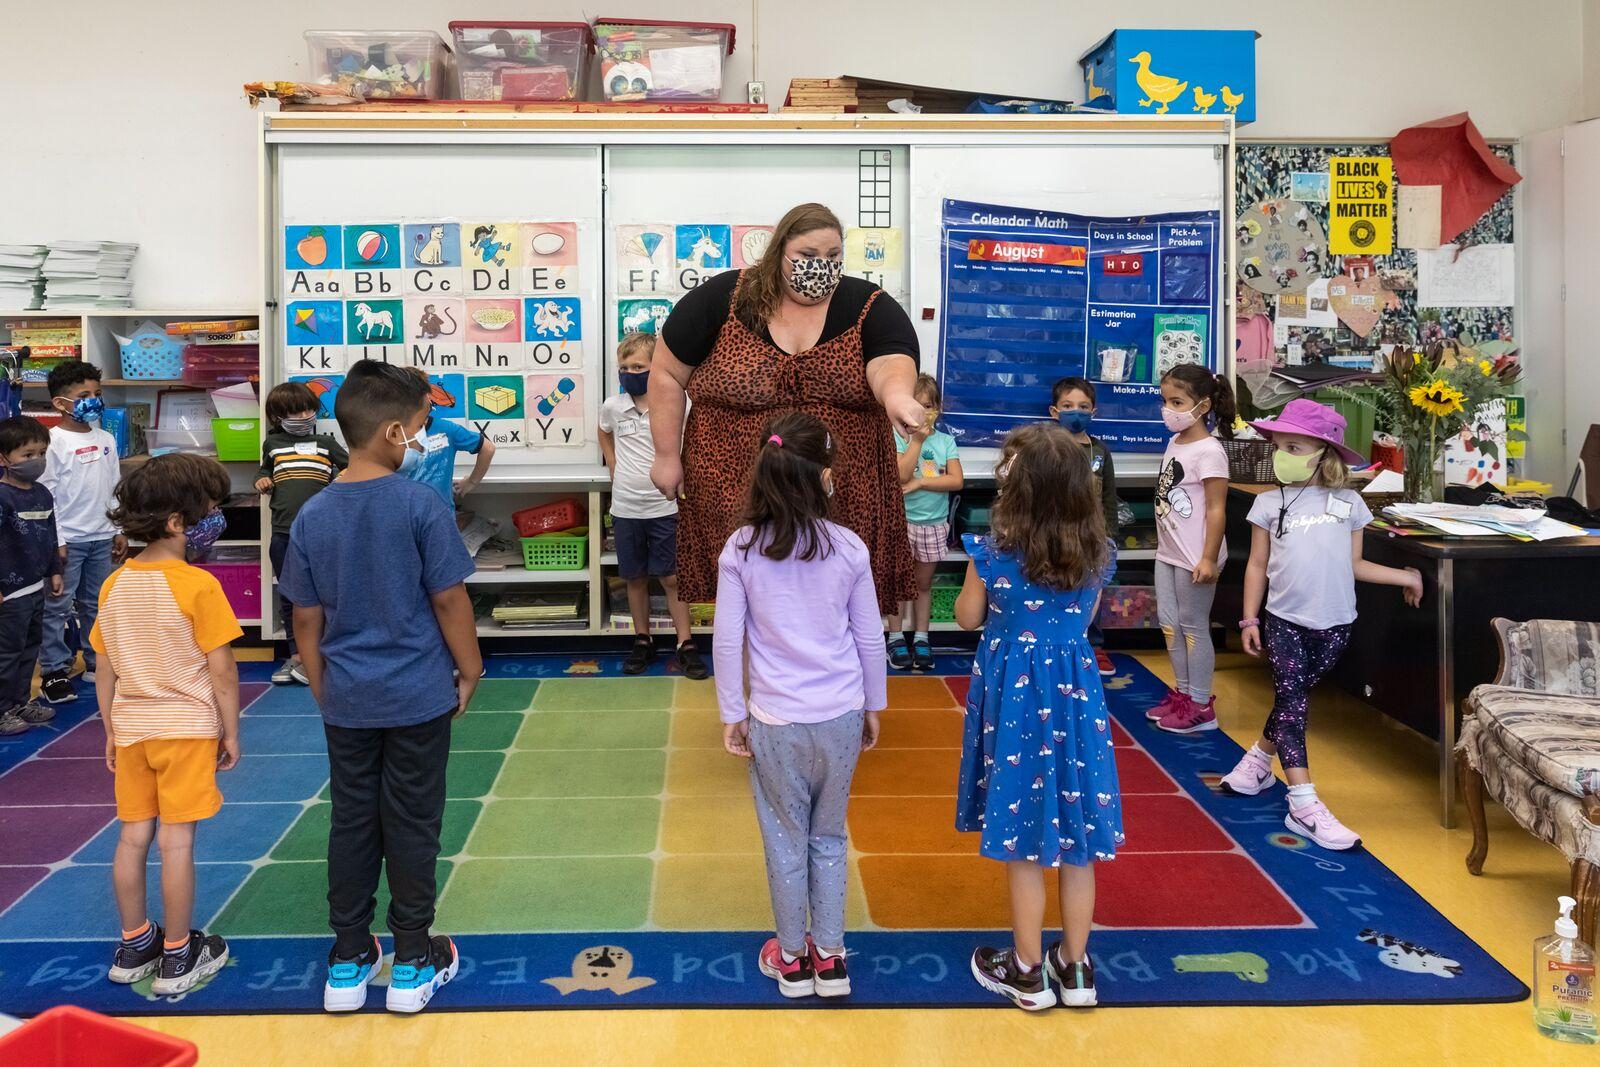 Washington Elementary School kindergarten teacher Ashleigh Talbott plays a getting-to-know-you game with students on August 16, 2021. Credit: Kelly Sullivan